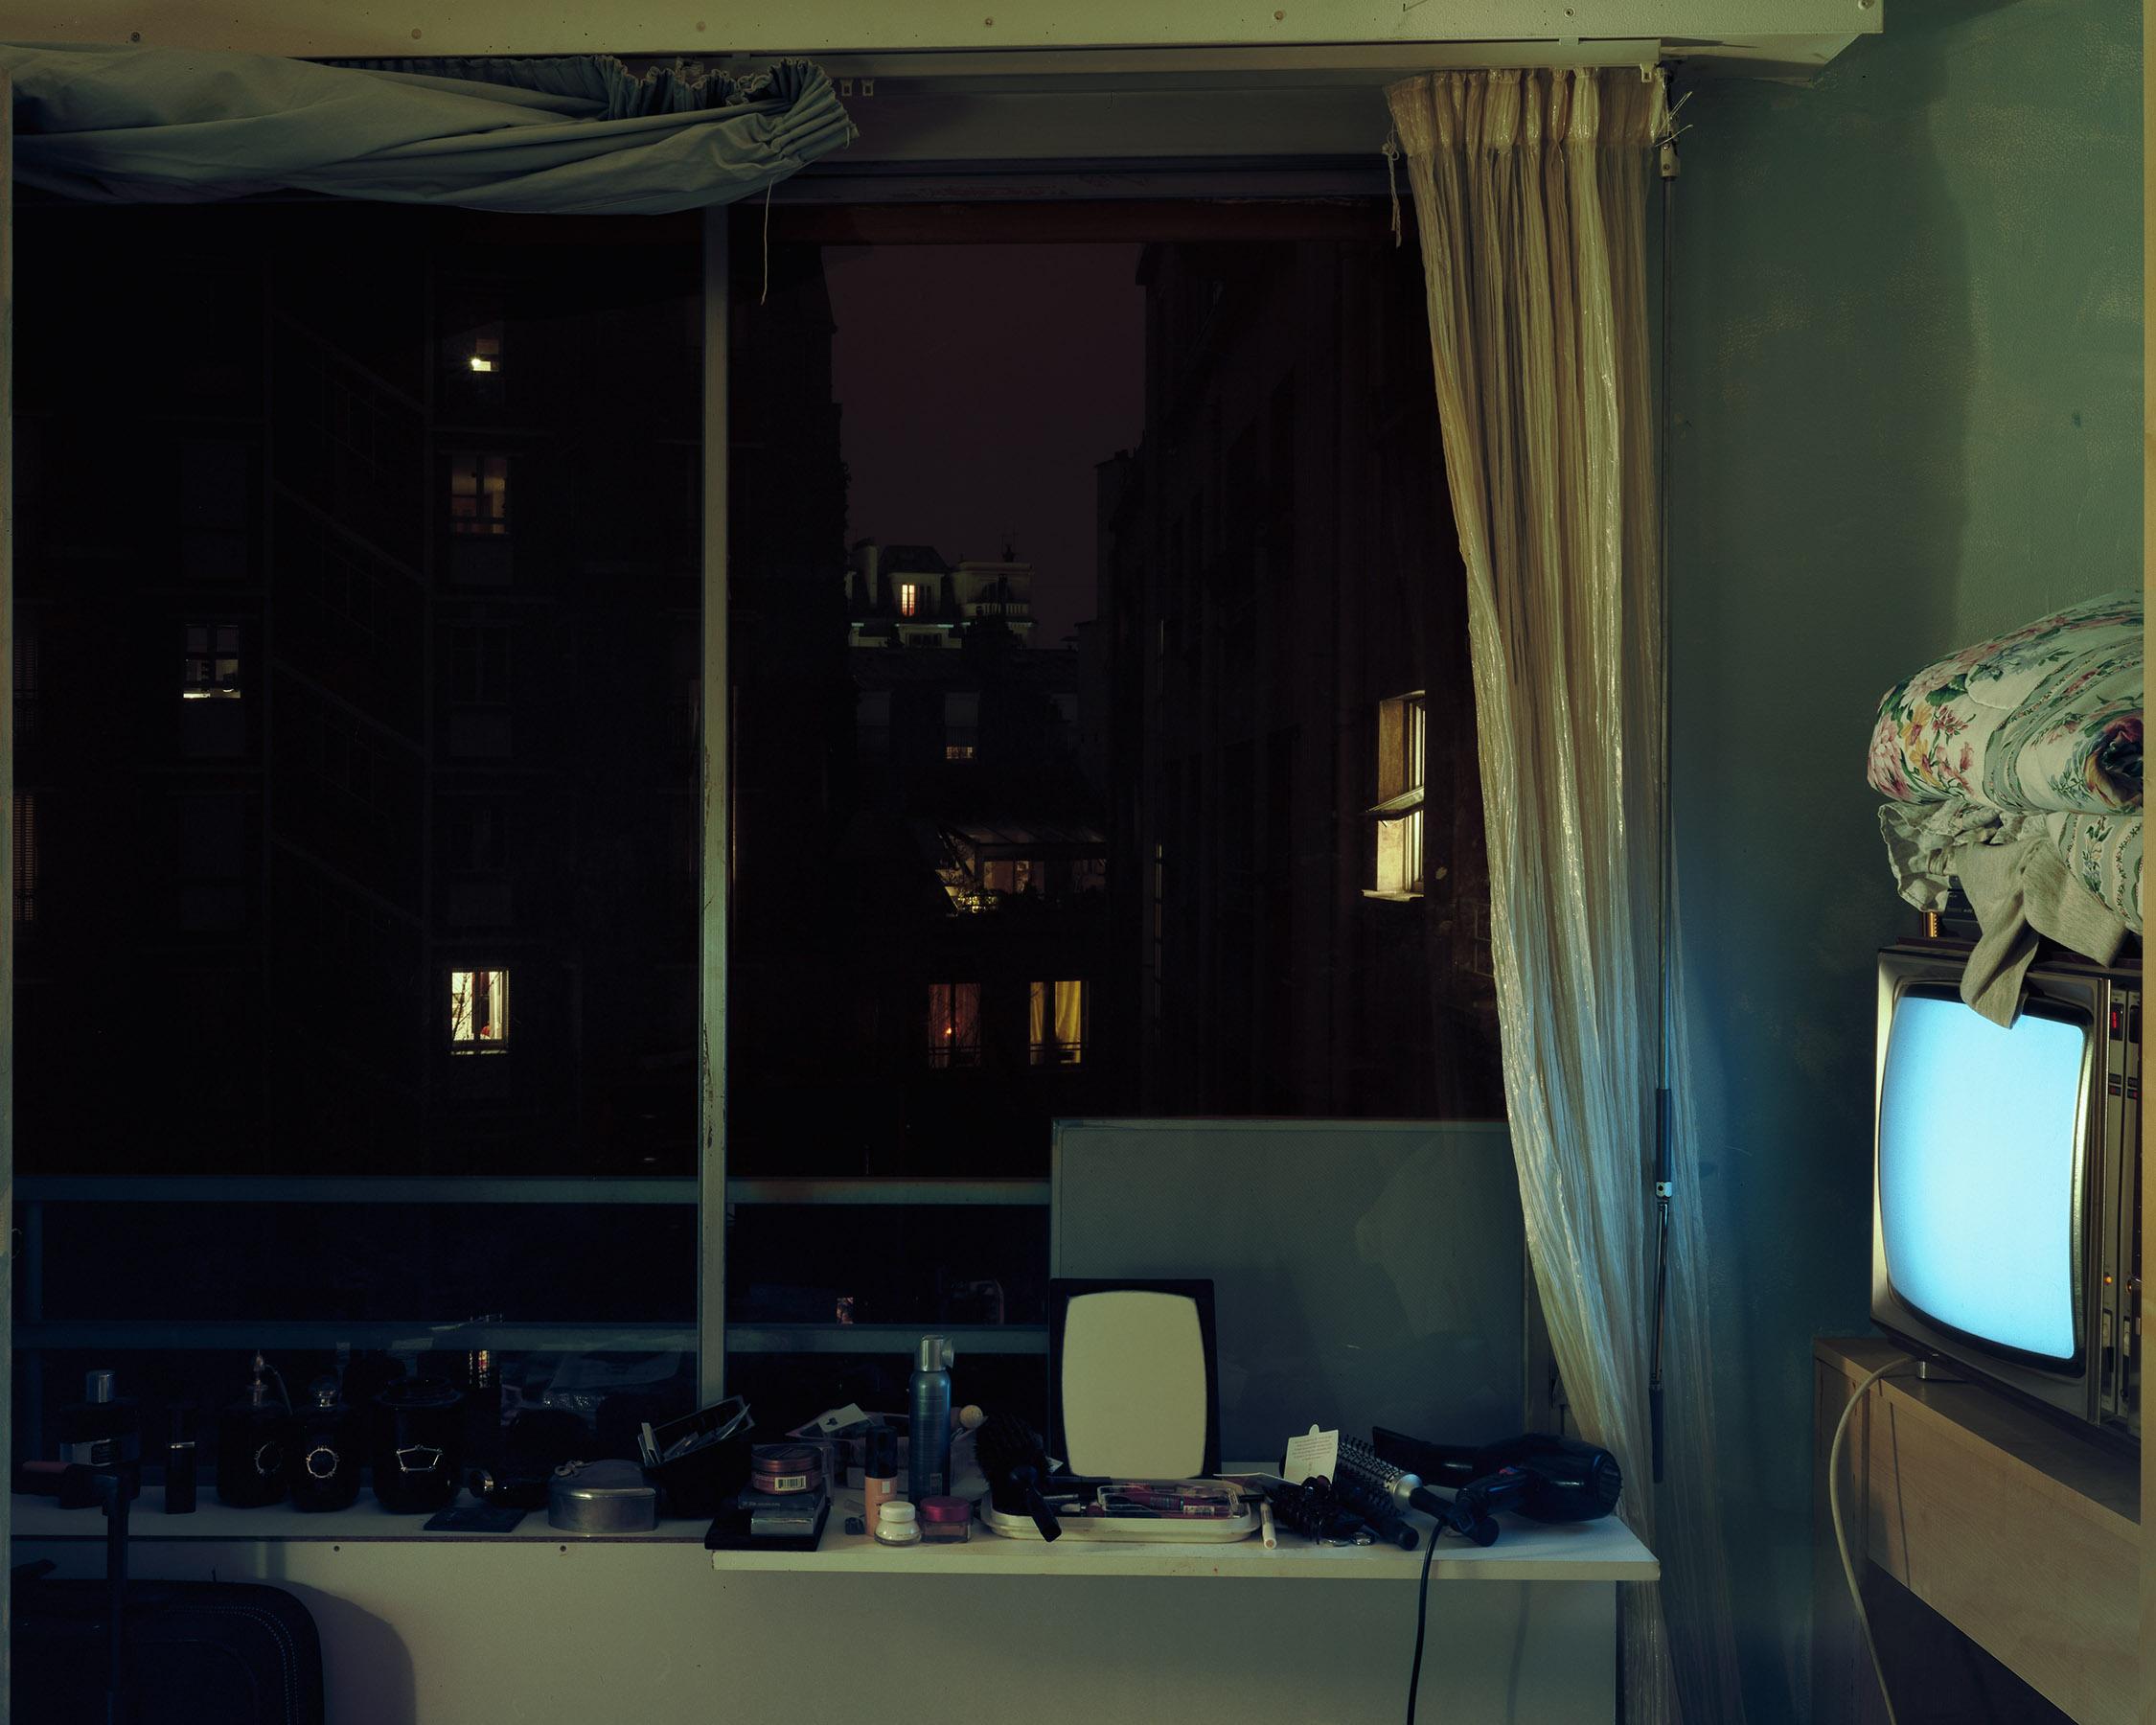 windows_talma_05.jpg